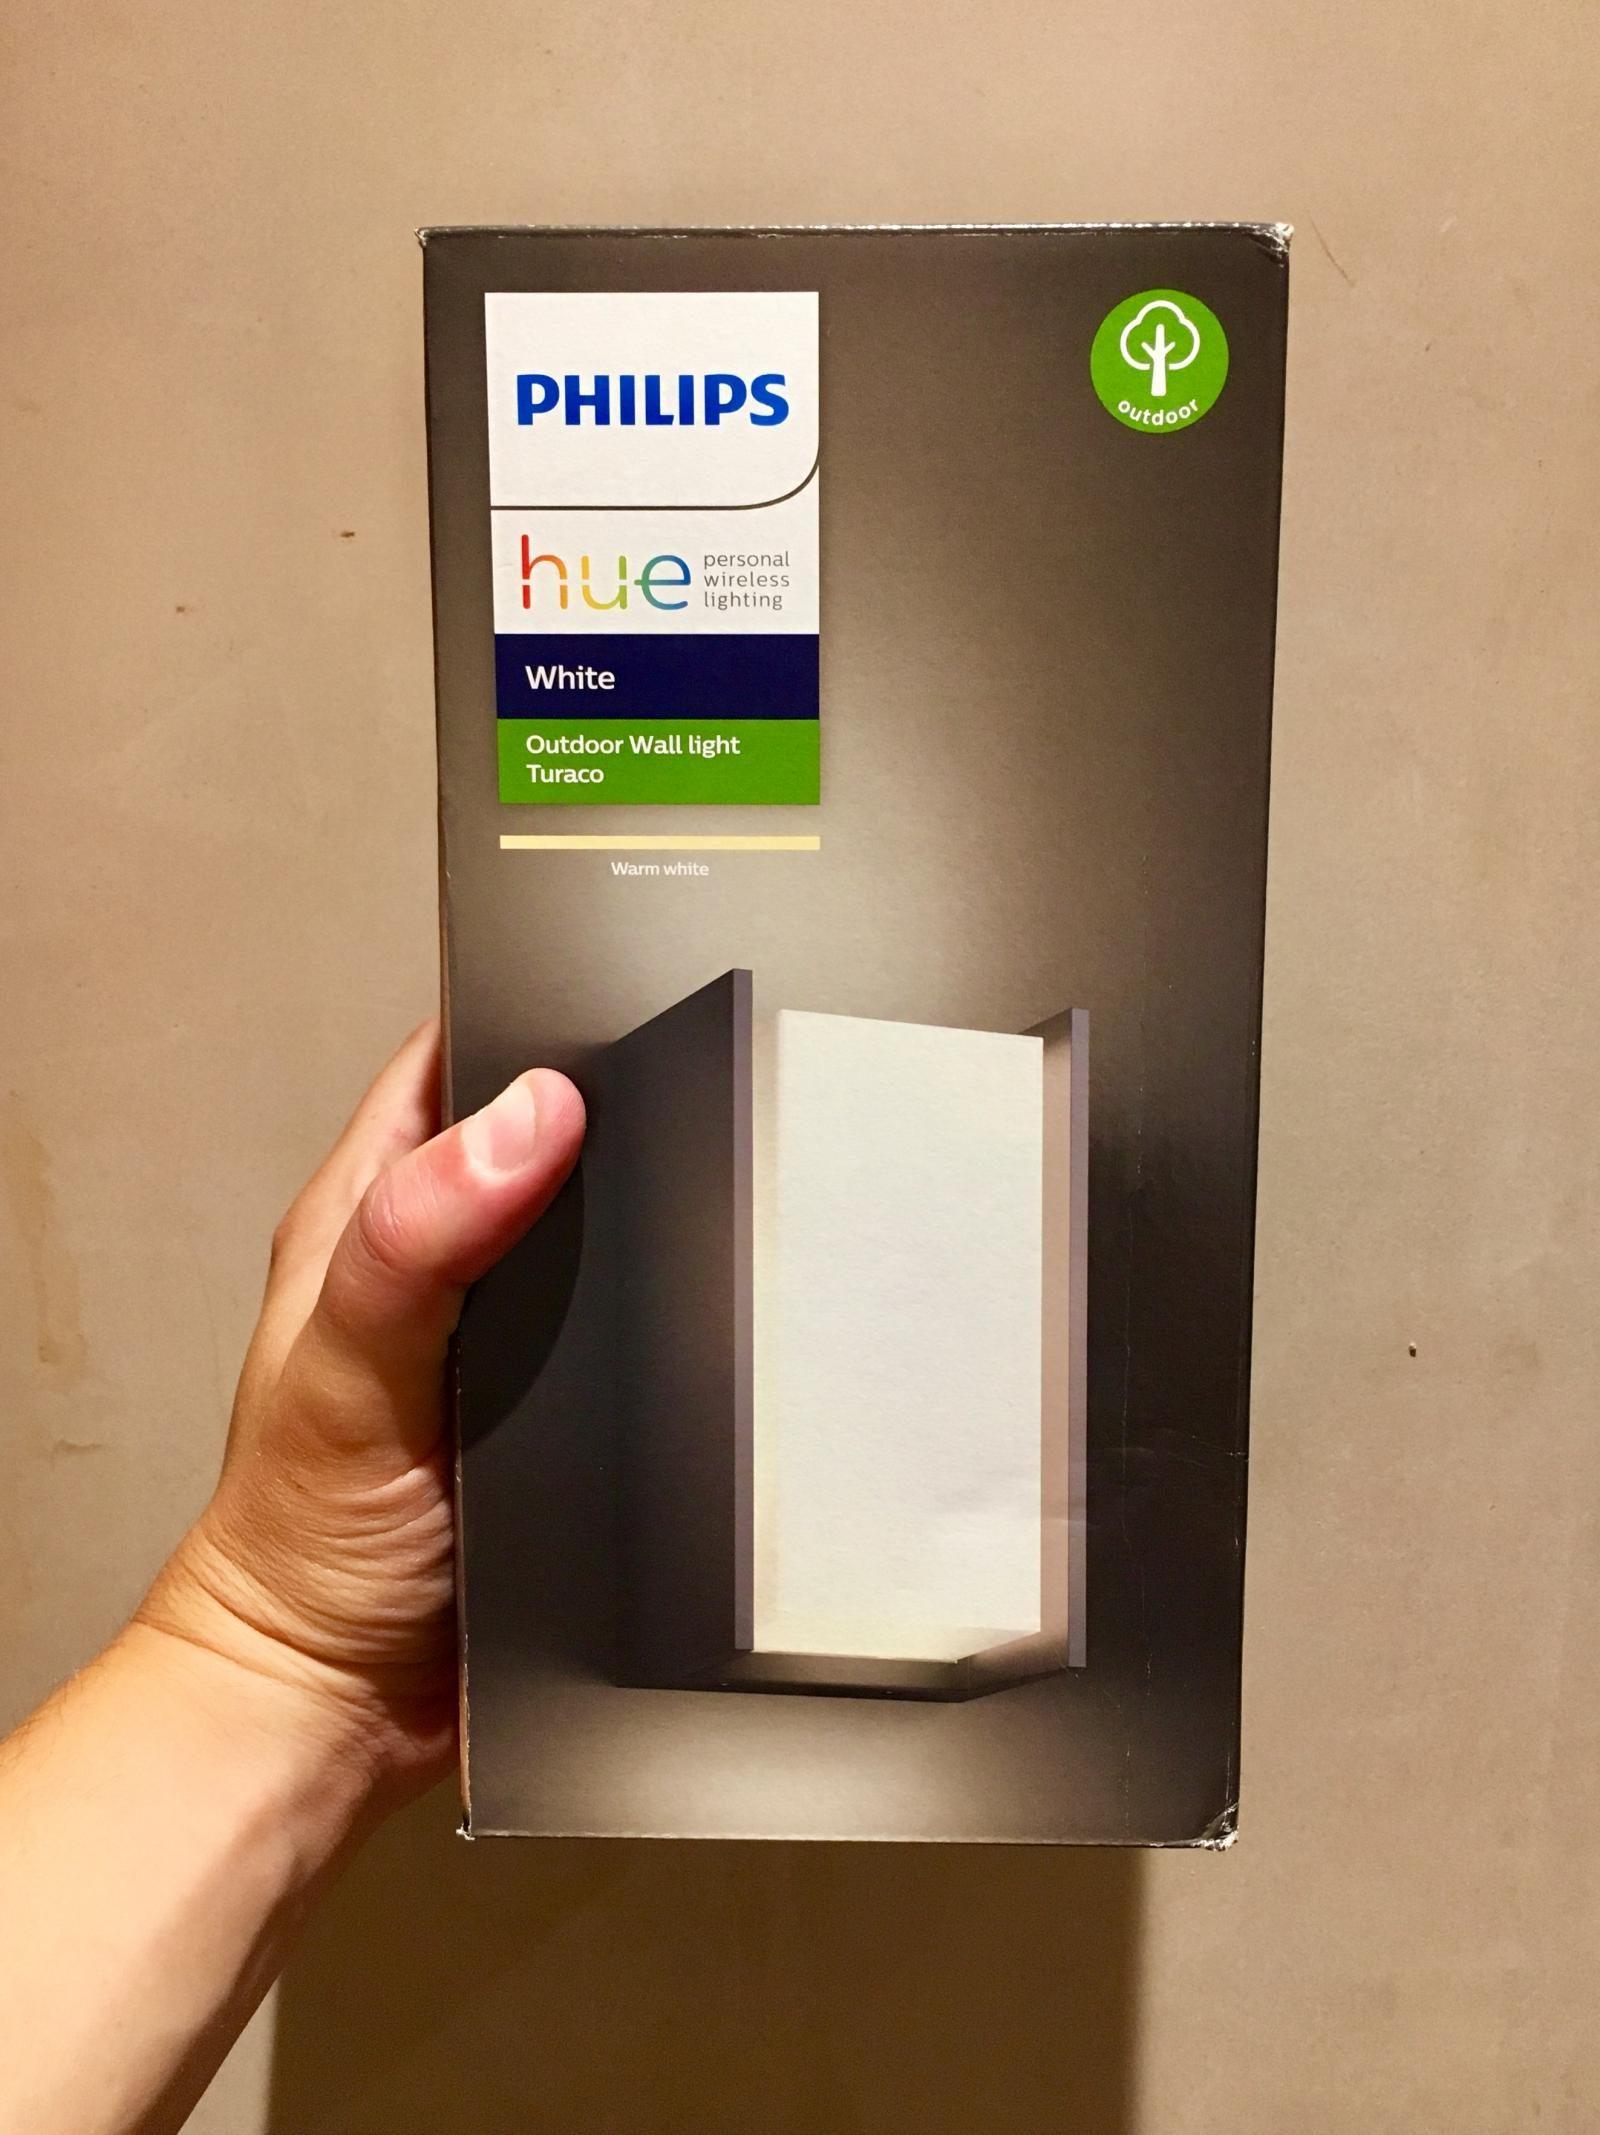 Philips Hue Outdoor Wall Light